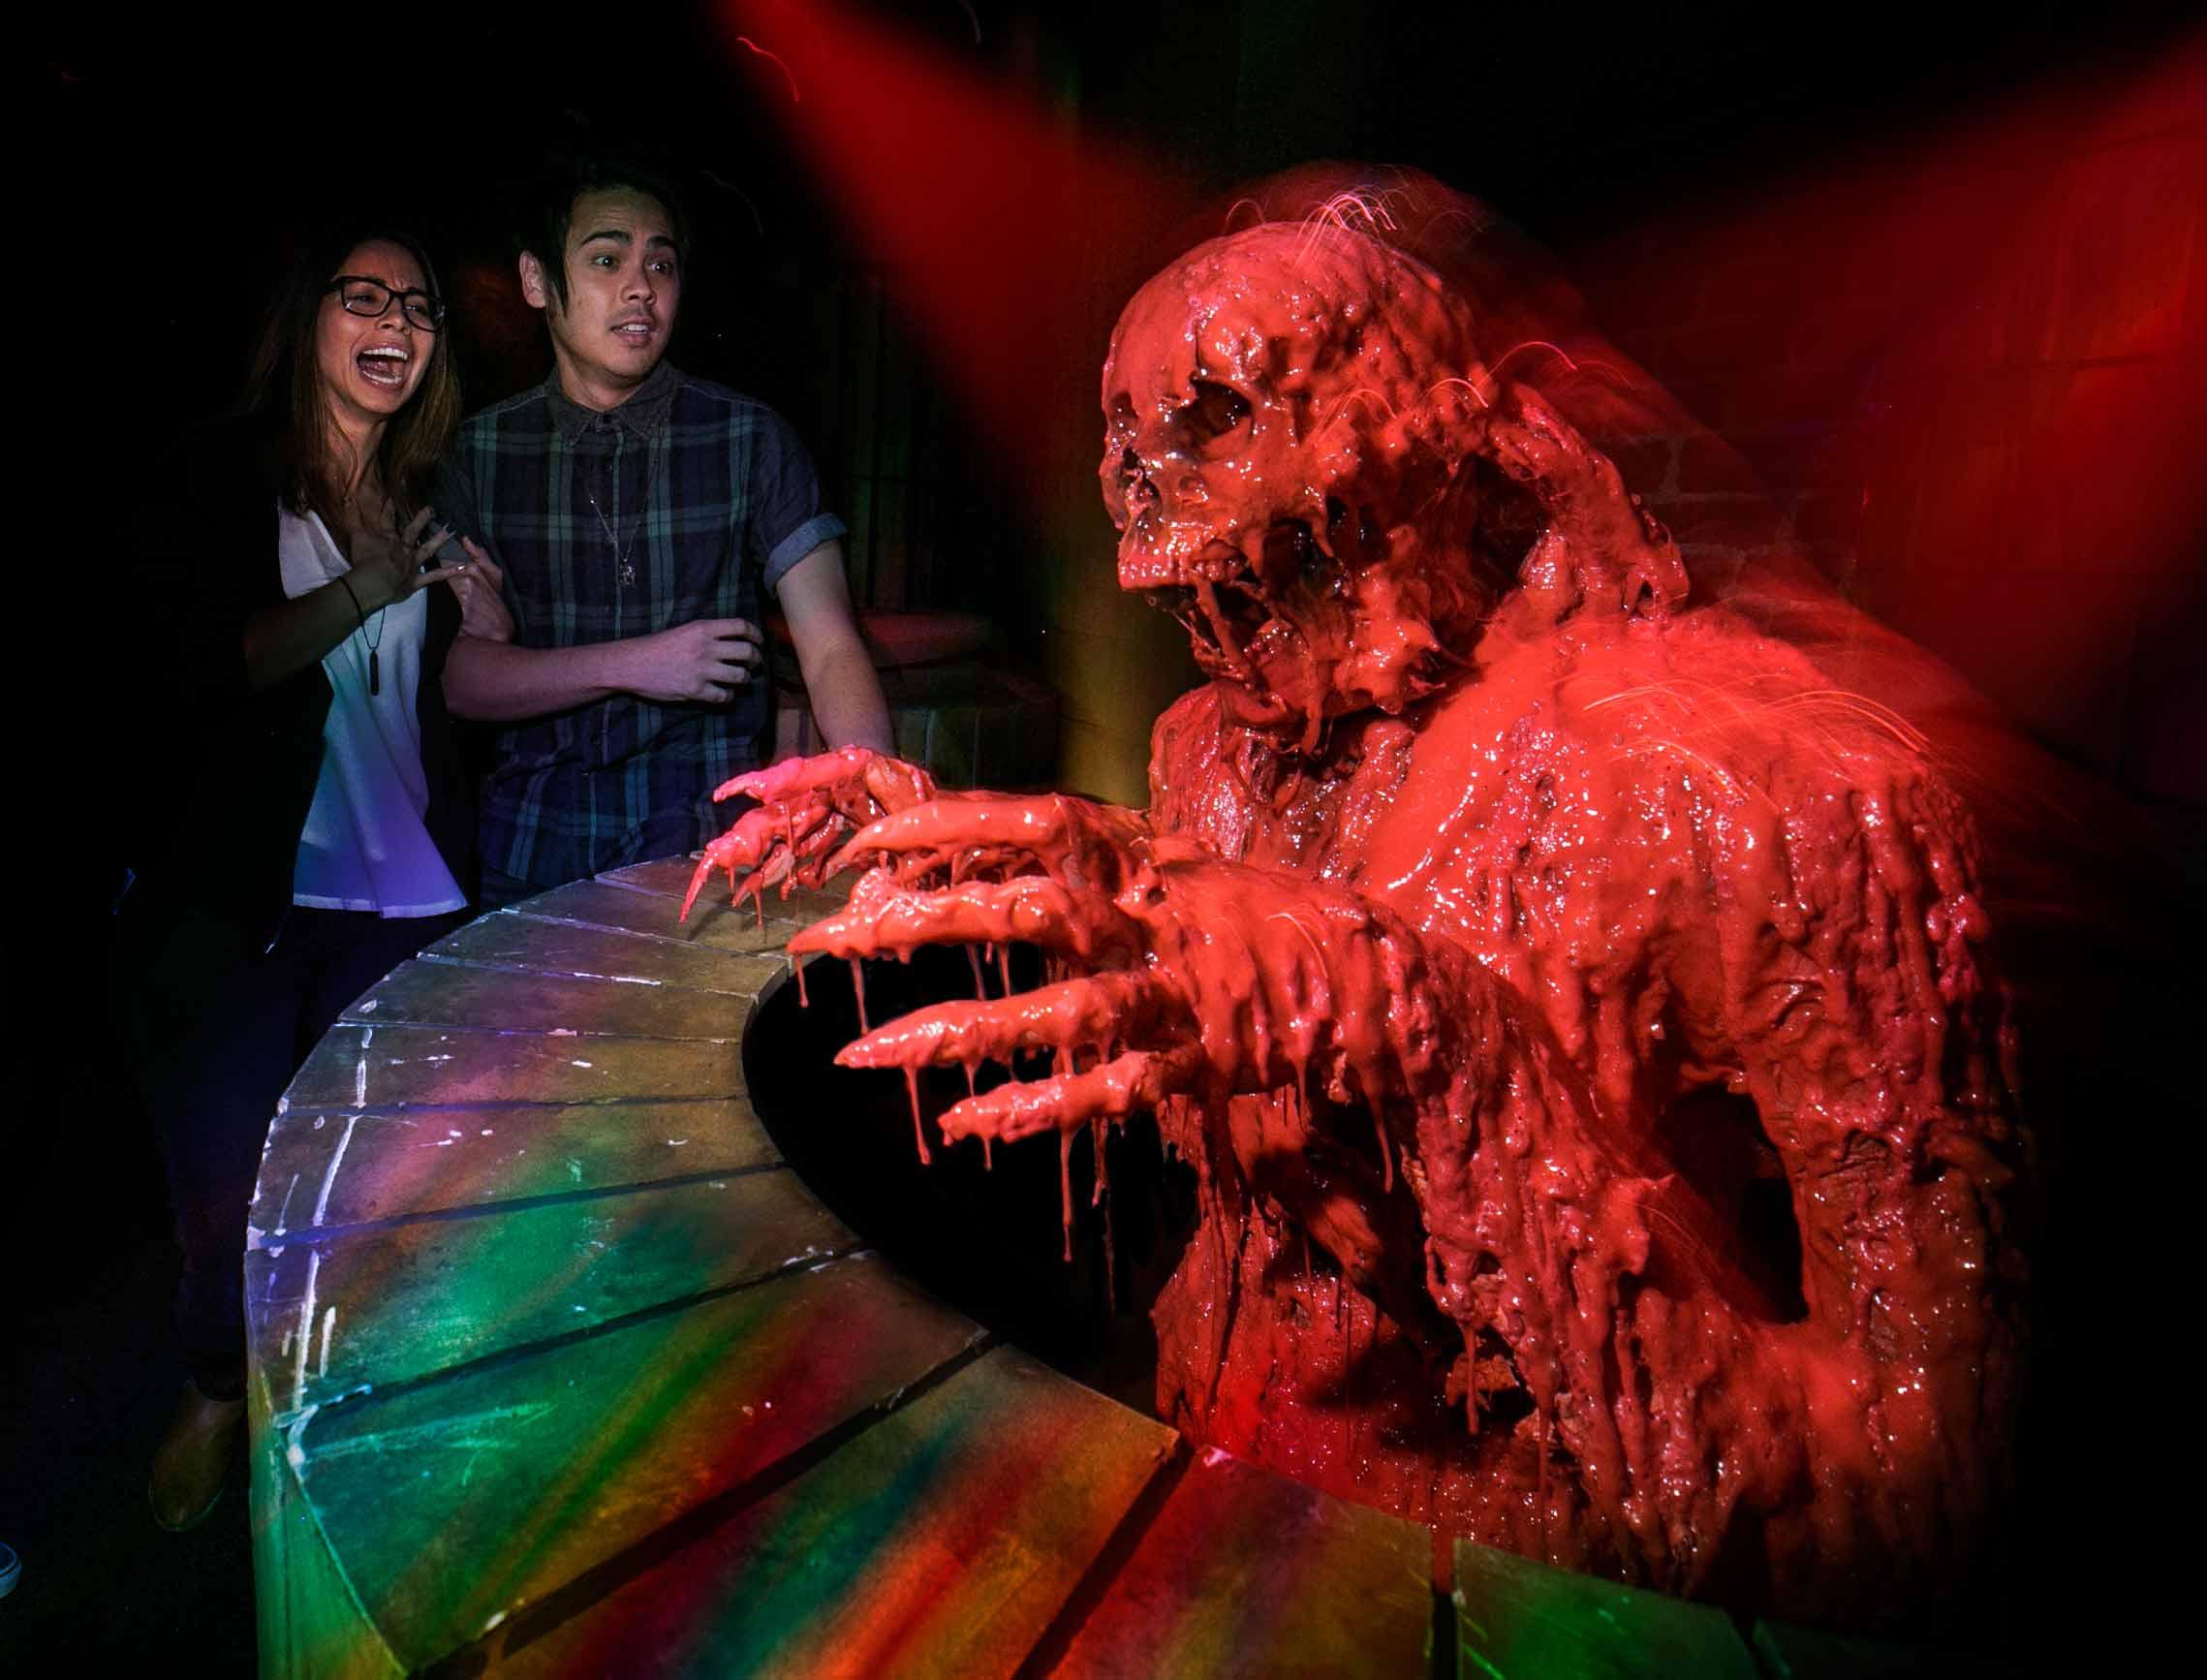 A-scene-From-Universal-Studios-Halloween-Maze,-Crimson----Peak